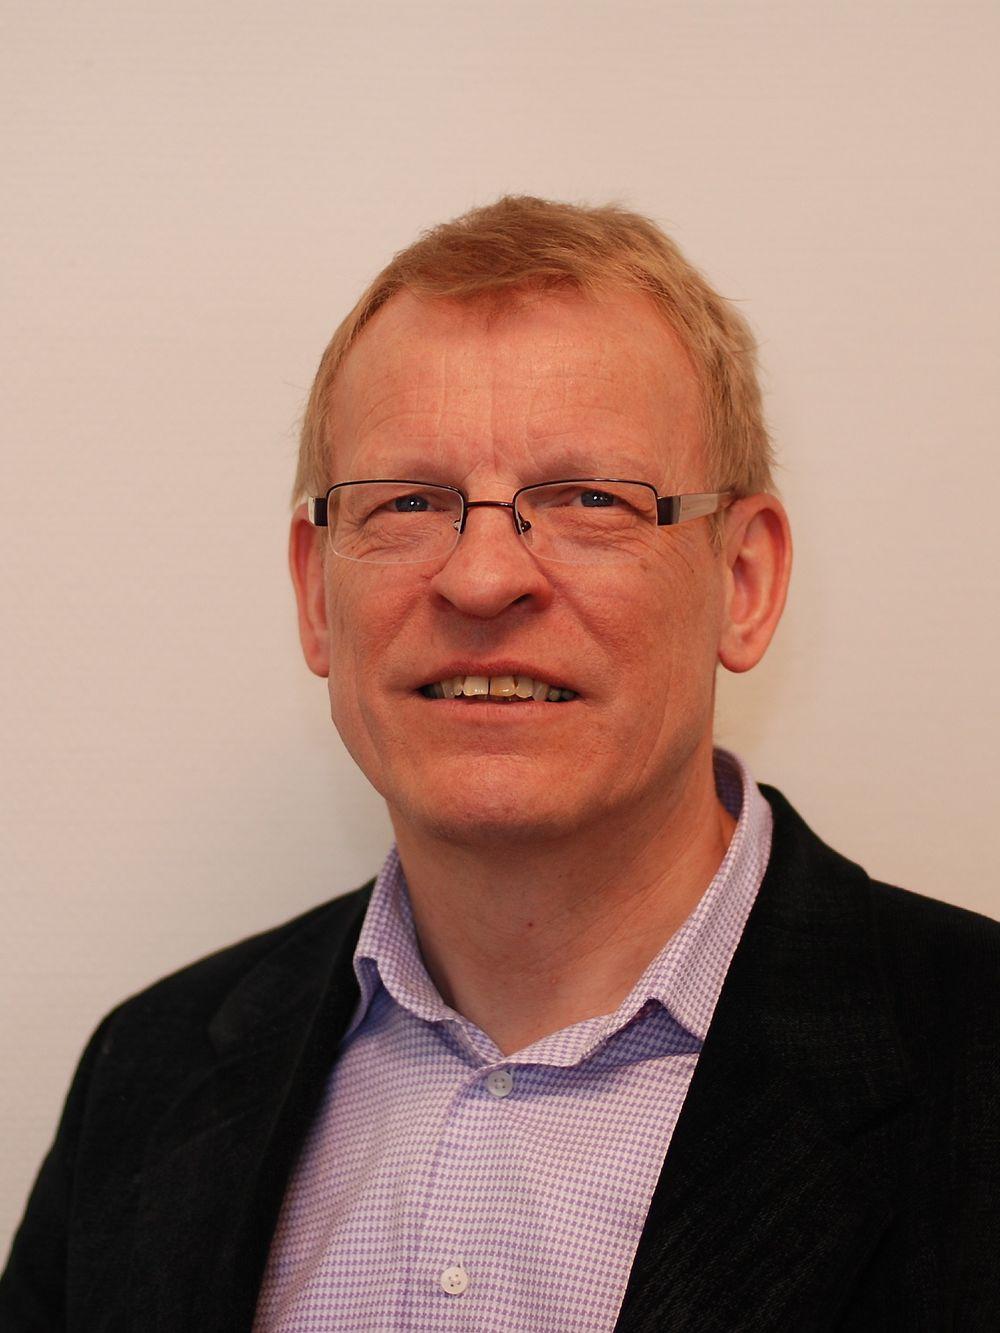 Torkel Nybø blir ny distriktssjef for Beijer på Østlandet, han stiller med 18 års fartstid i selskapet.